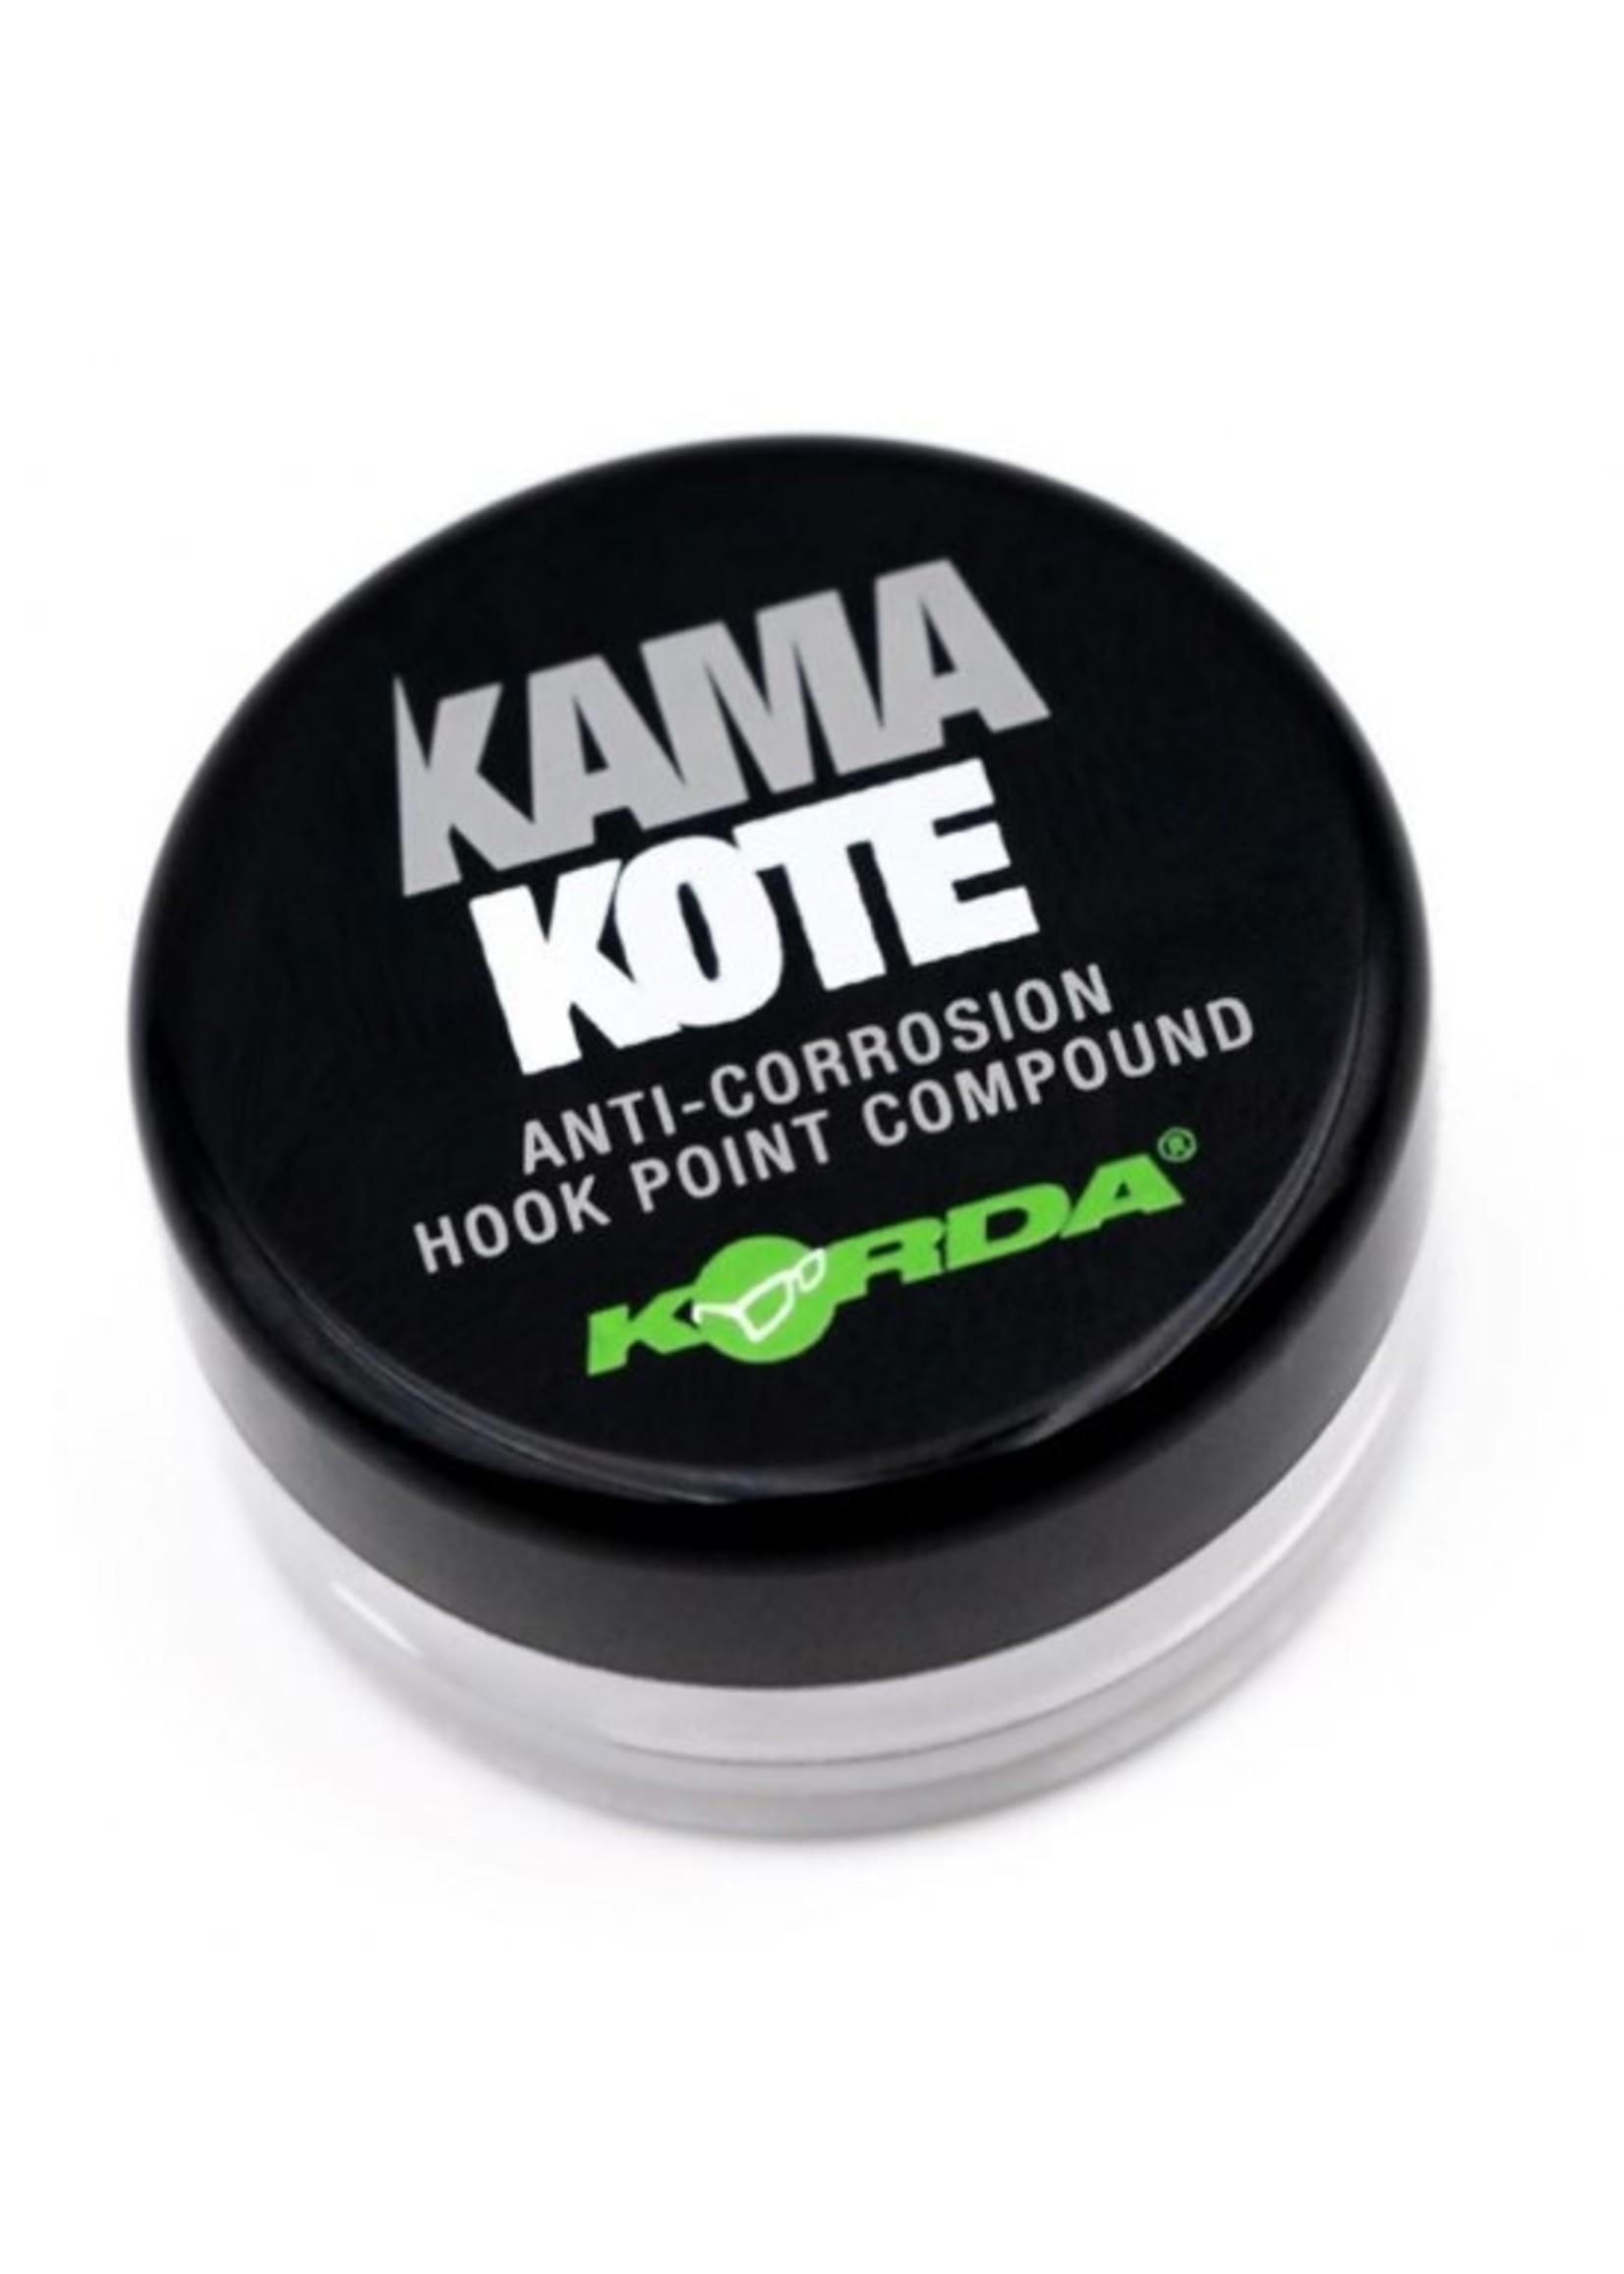 korda Korda Kamakote Hook Point Compound